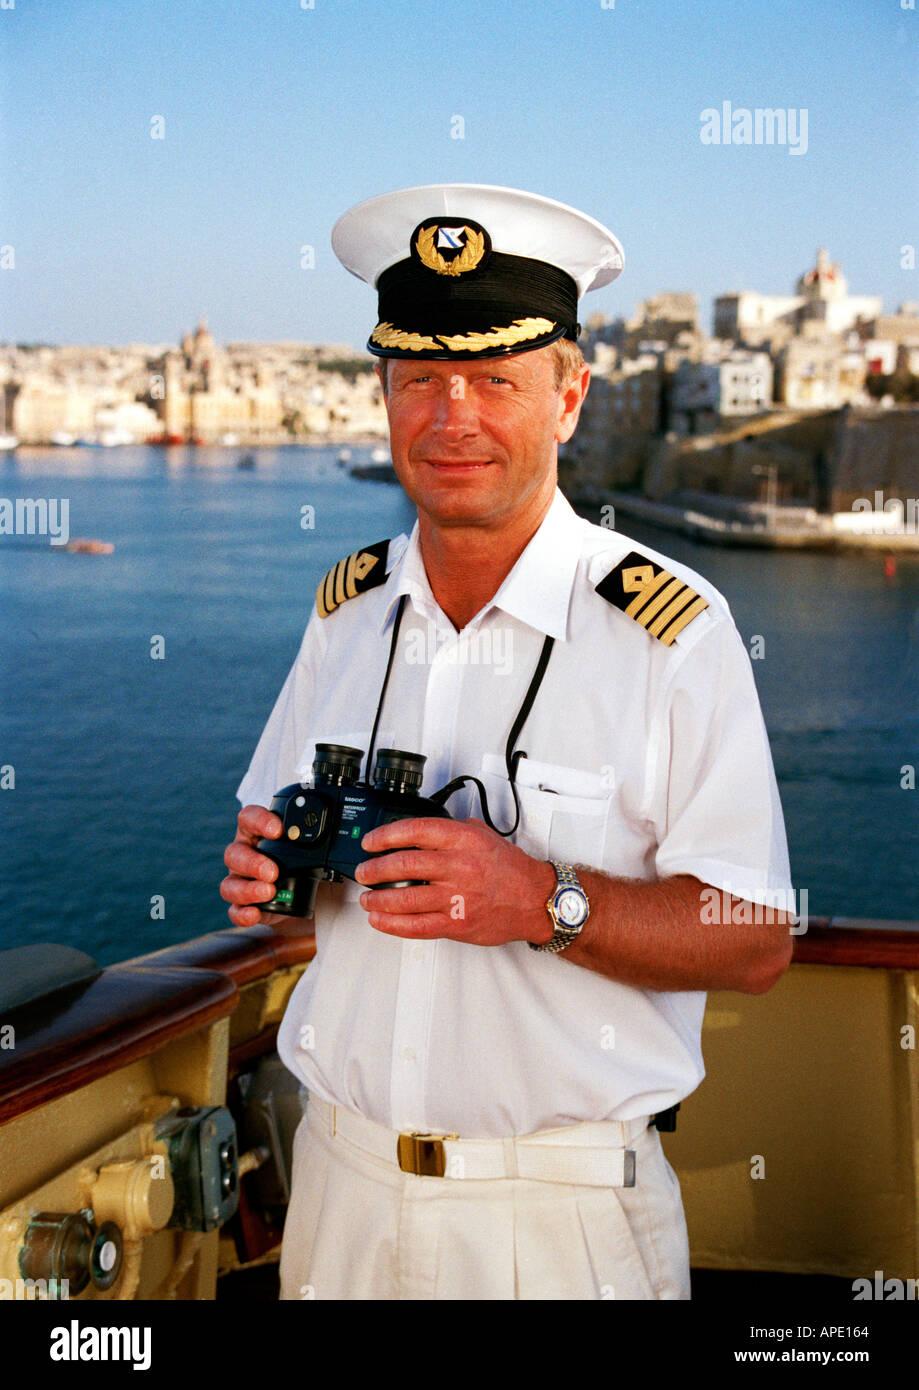 Ships Captain Stock Photos & Ships Captain Stock Images ...